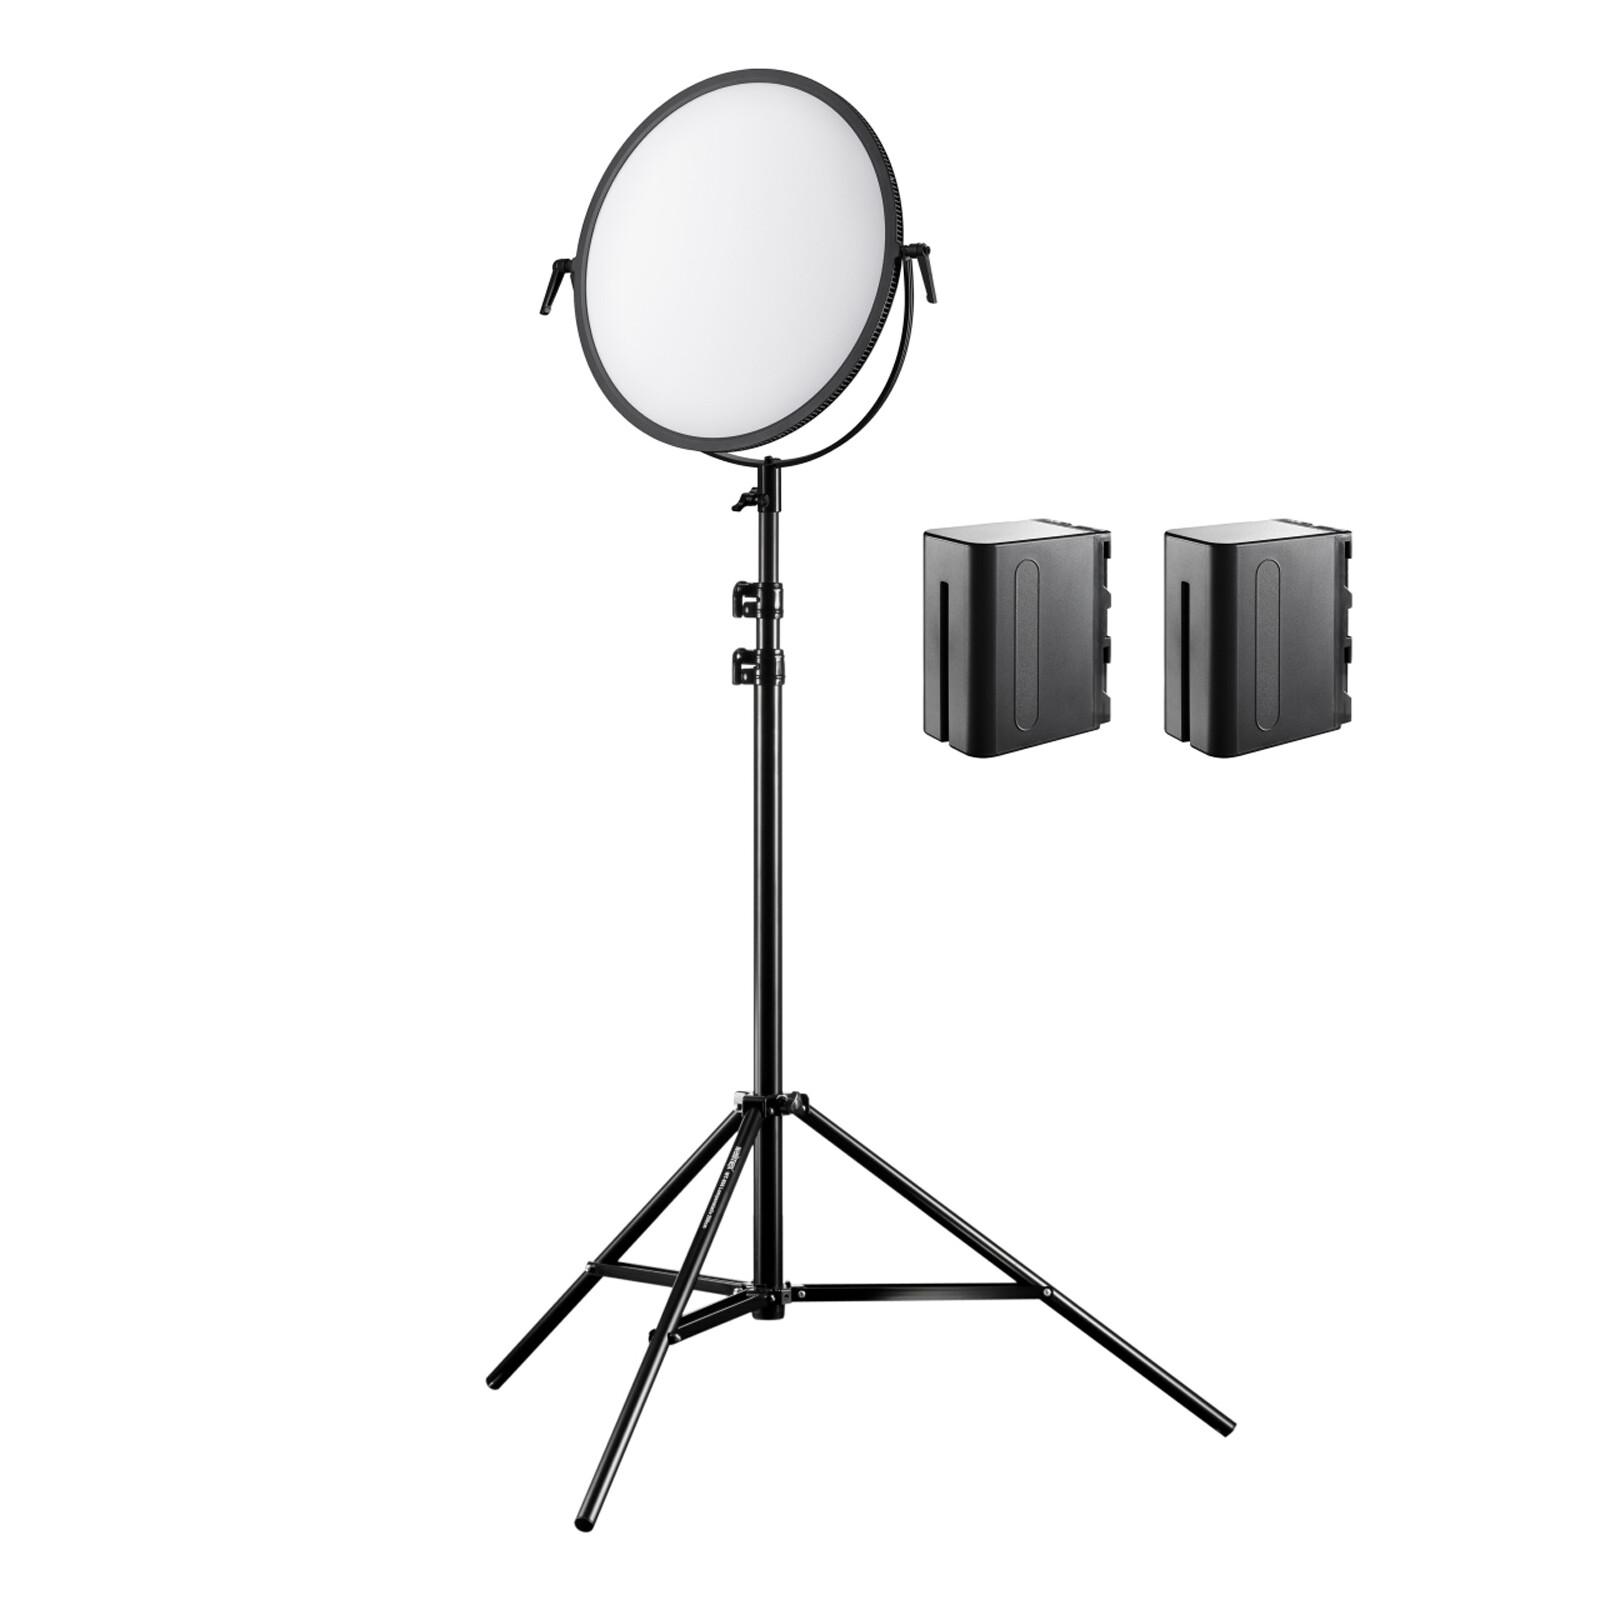 walimex pro Soft LED 700 Round Bi Color Set2